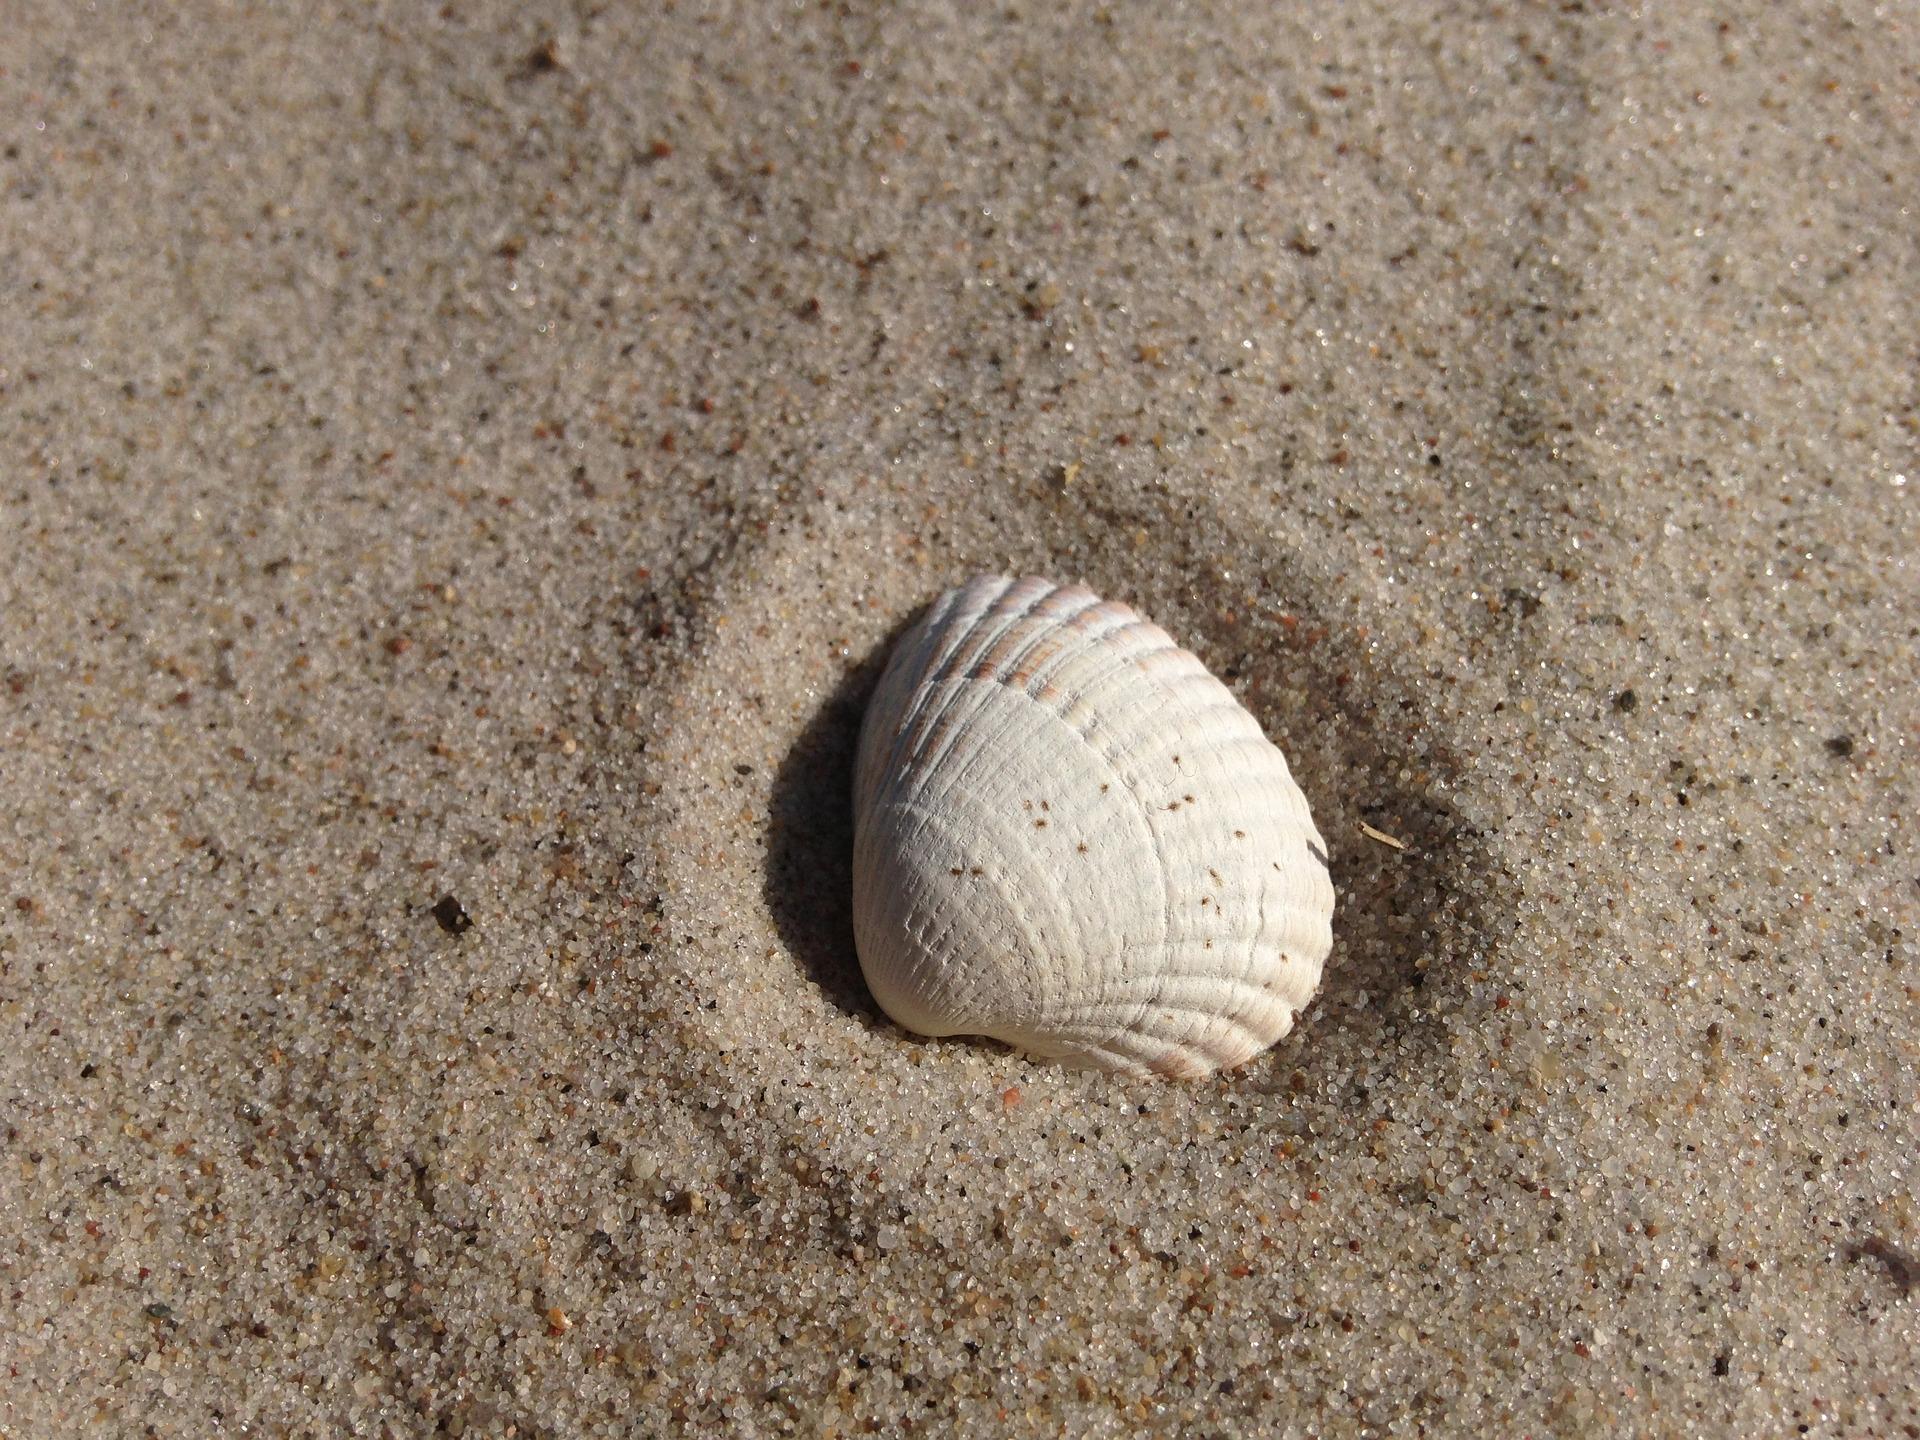 shell-812254_1920